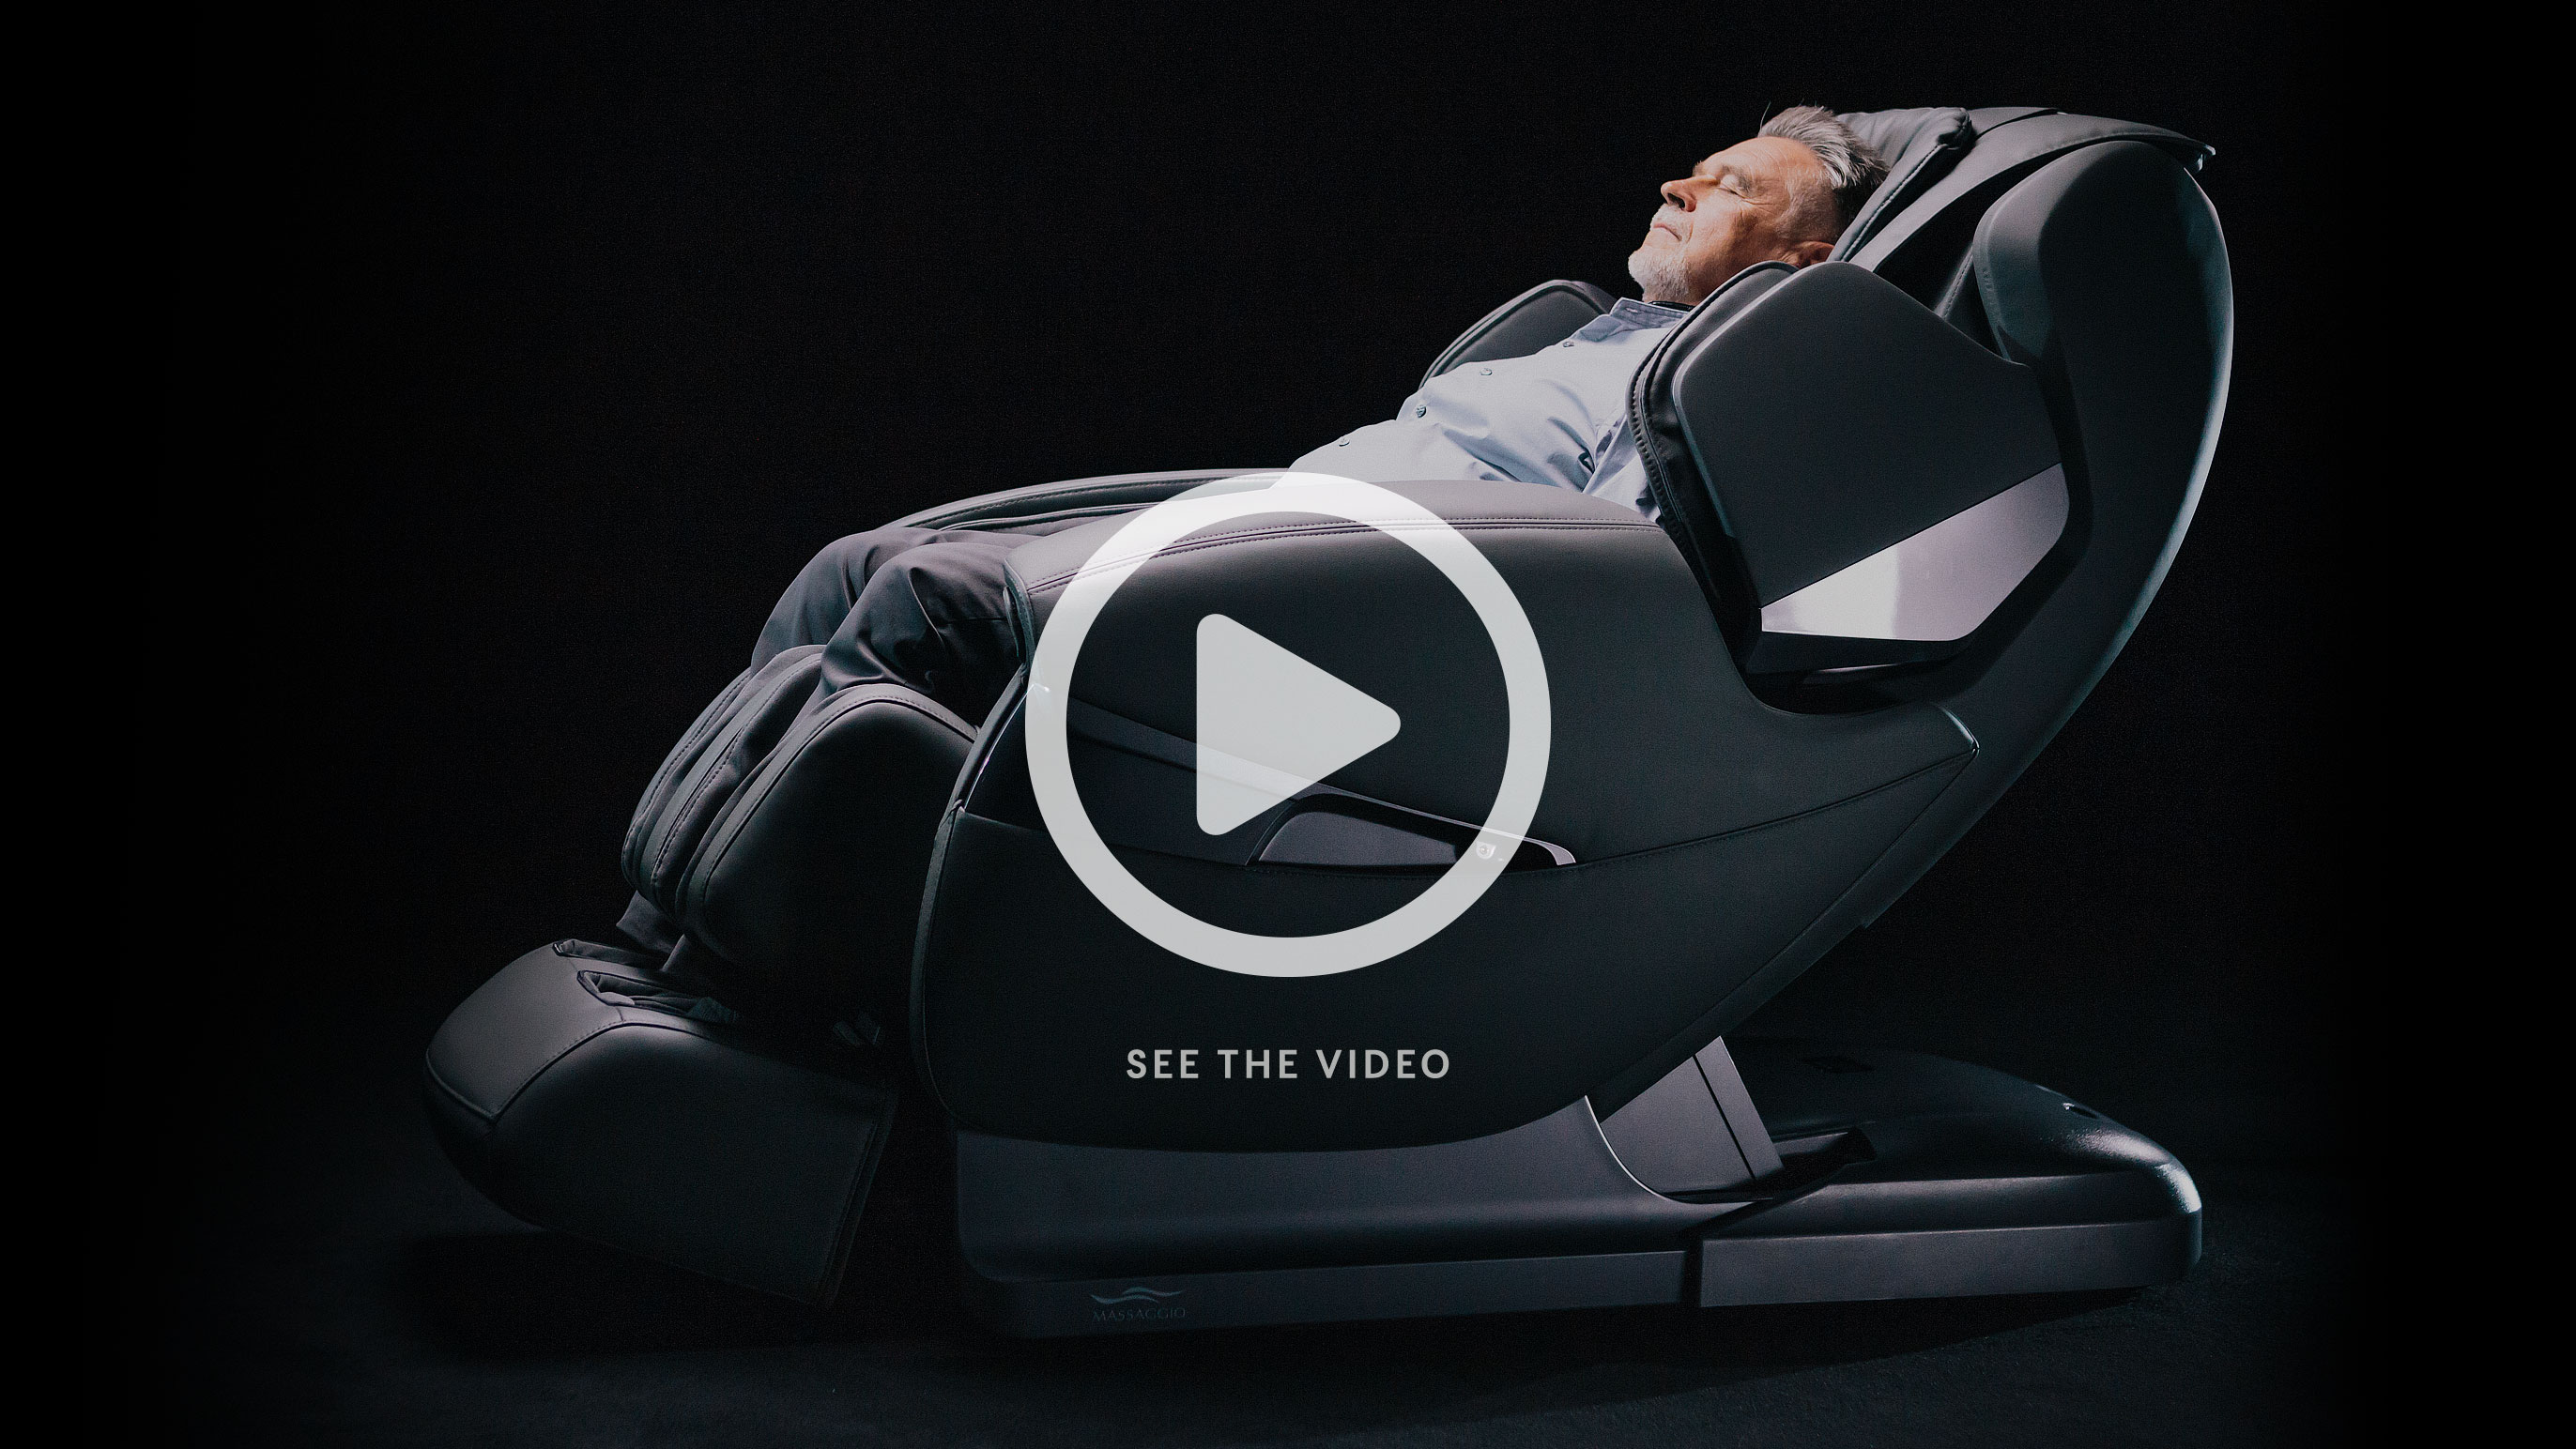 See the video about Massaggio Stravagante